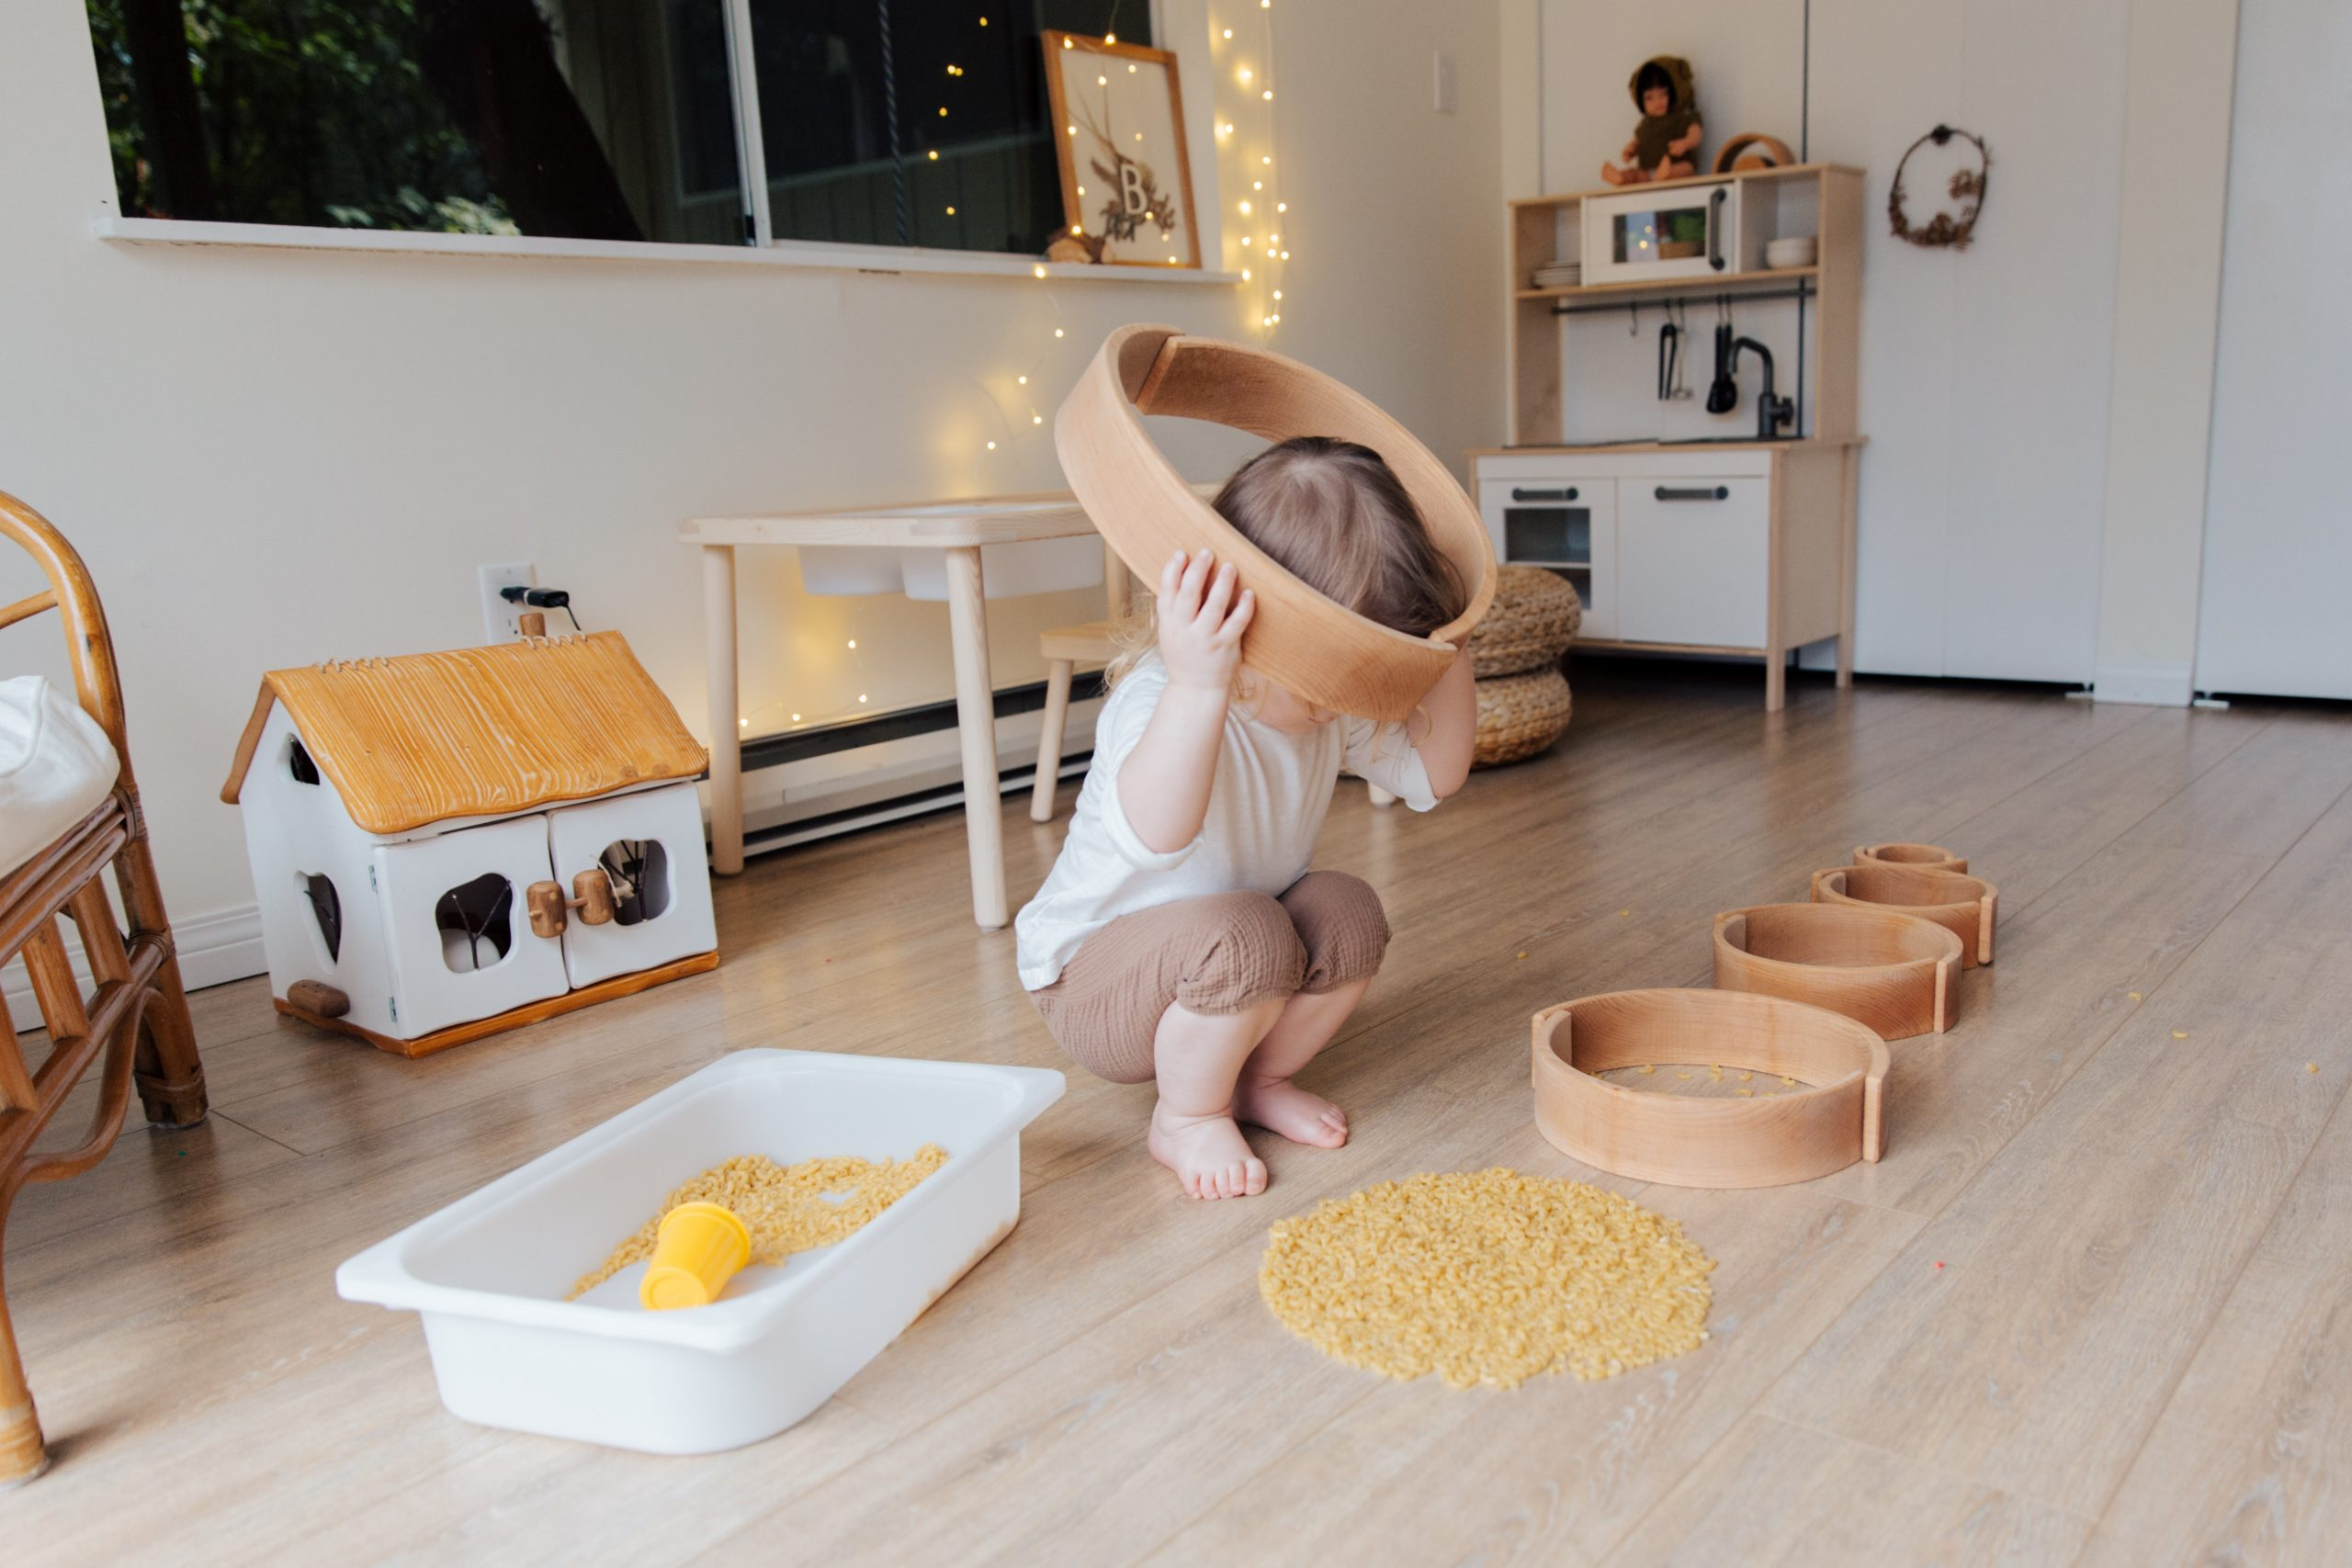 Toddler doing sensory play